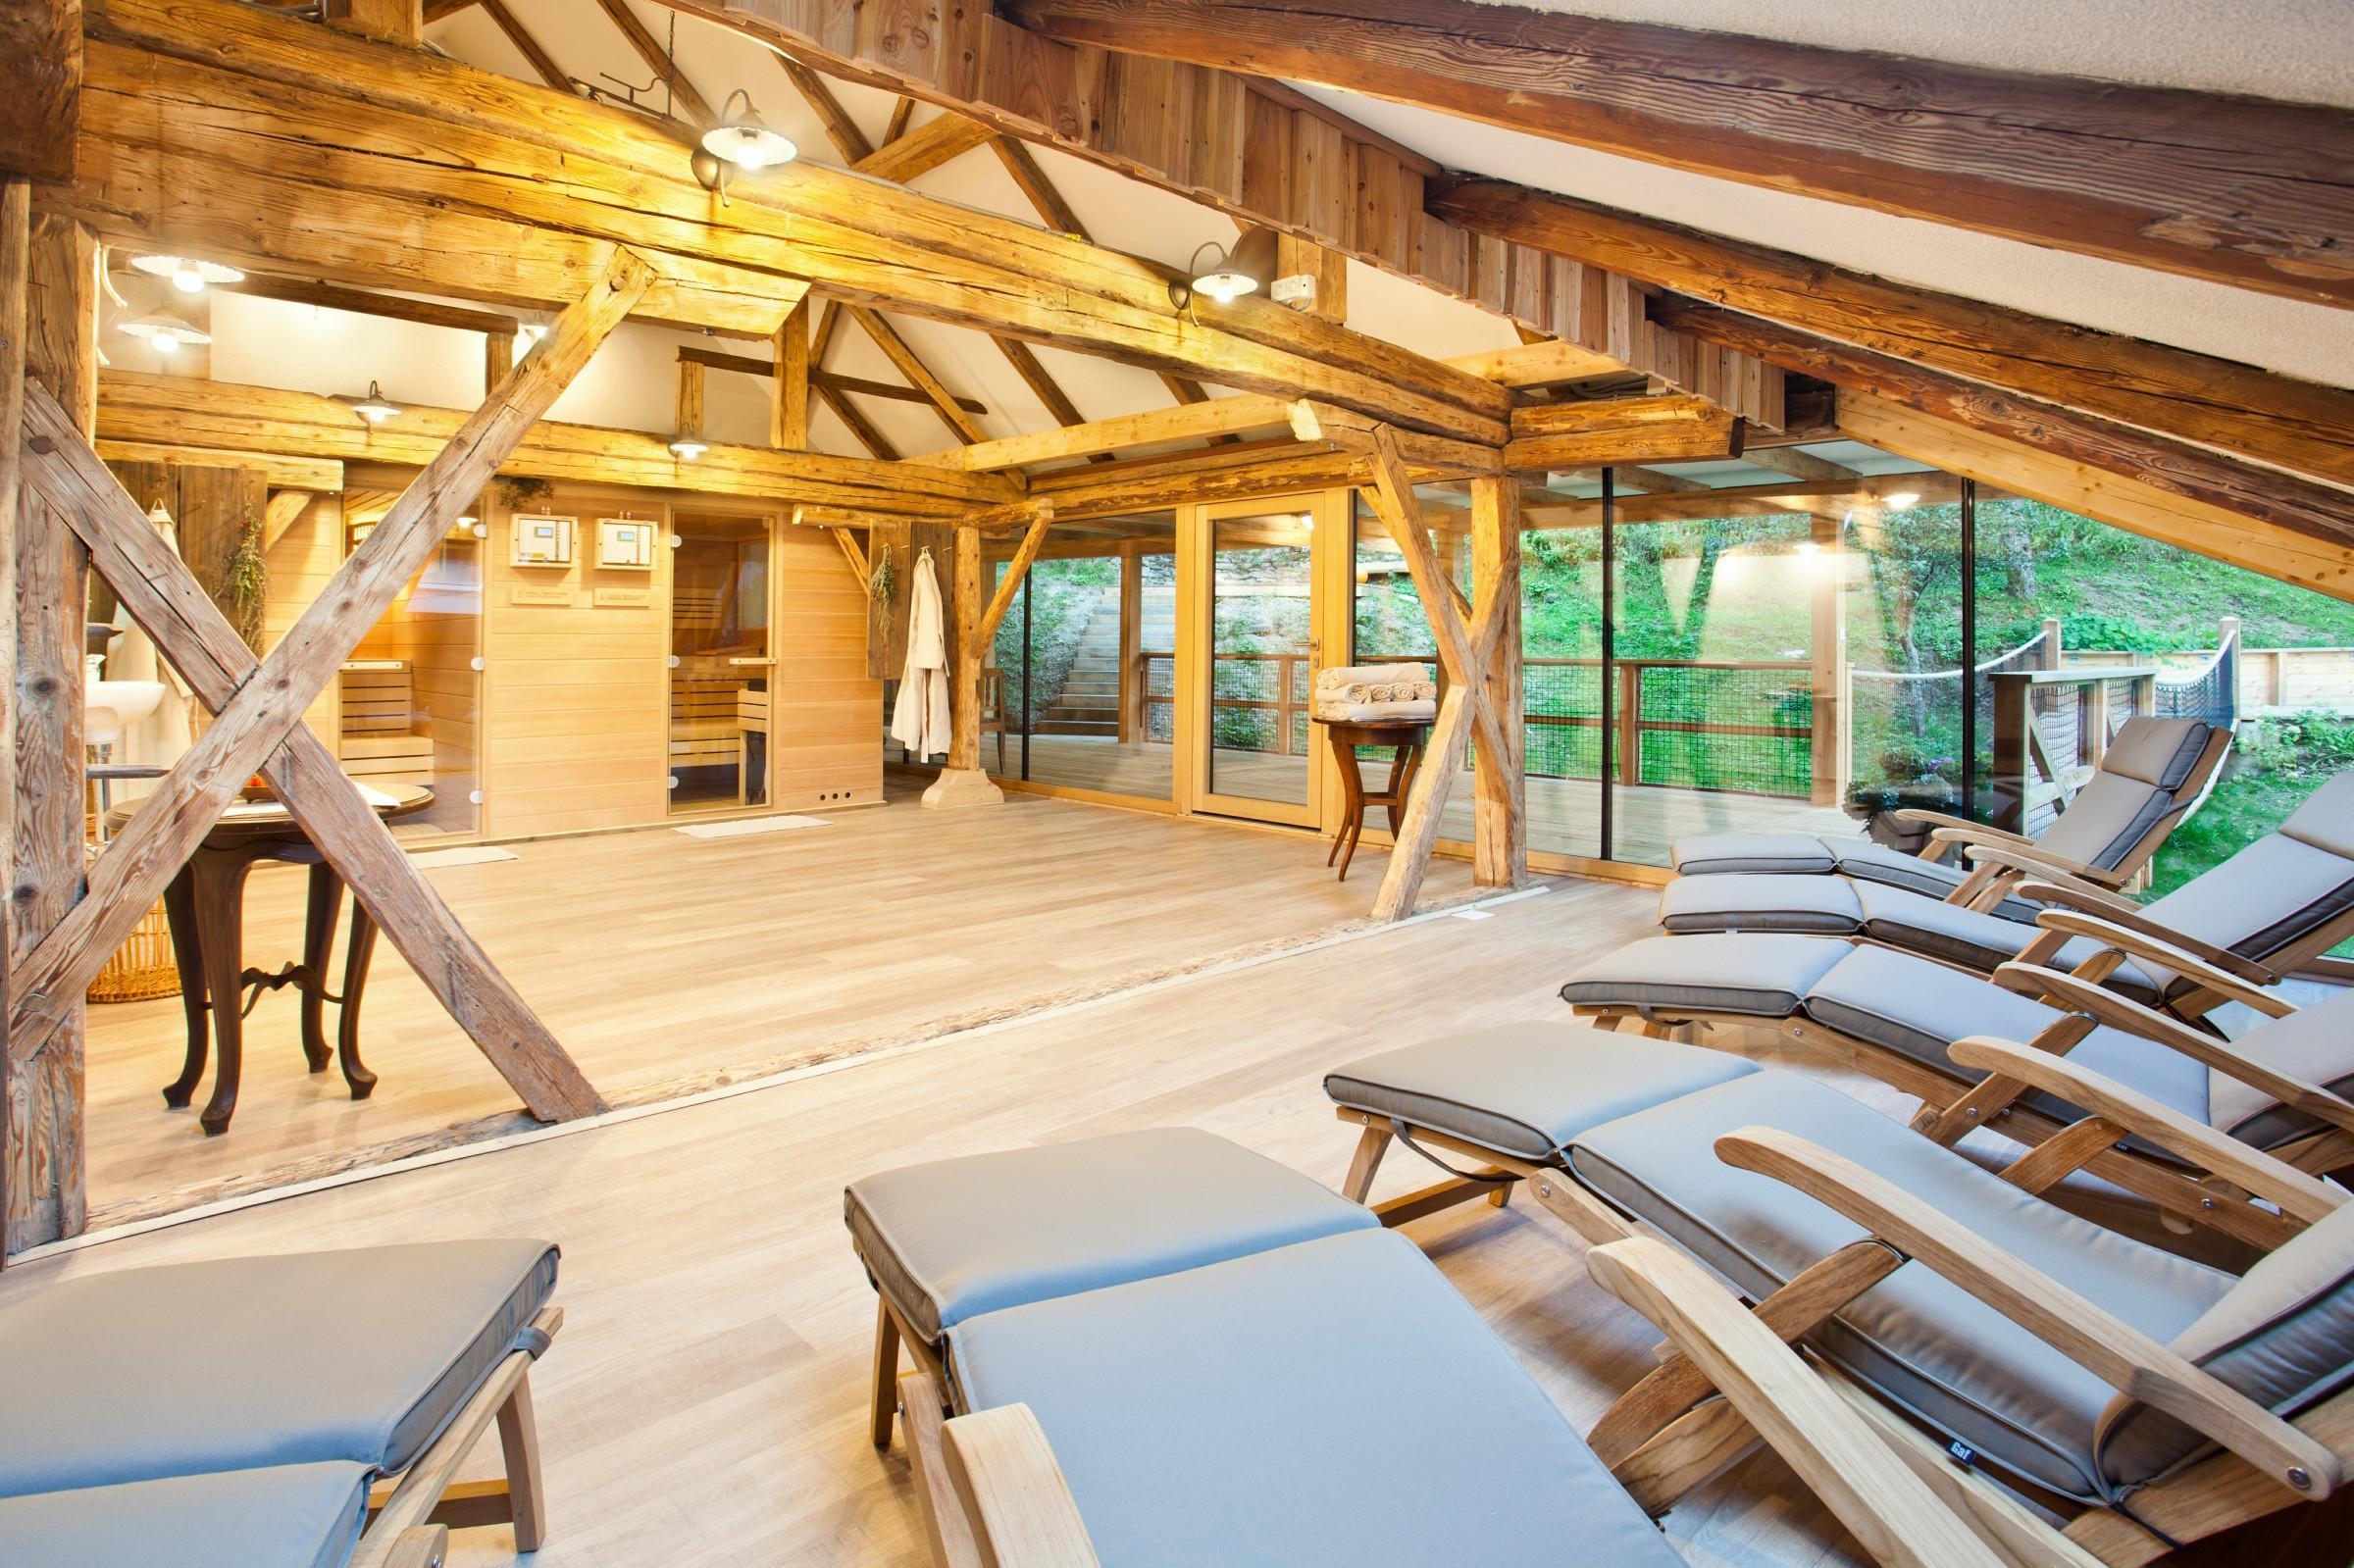 FormatFactoryCharming Herbal- Wellness center, foto Jost Gantar, Savinja Alps